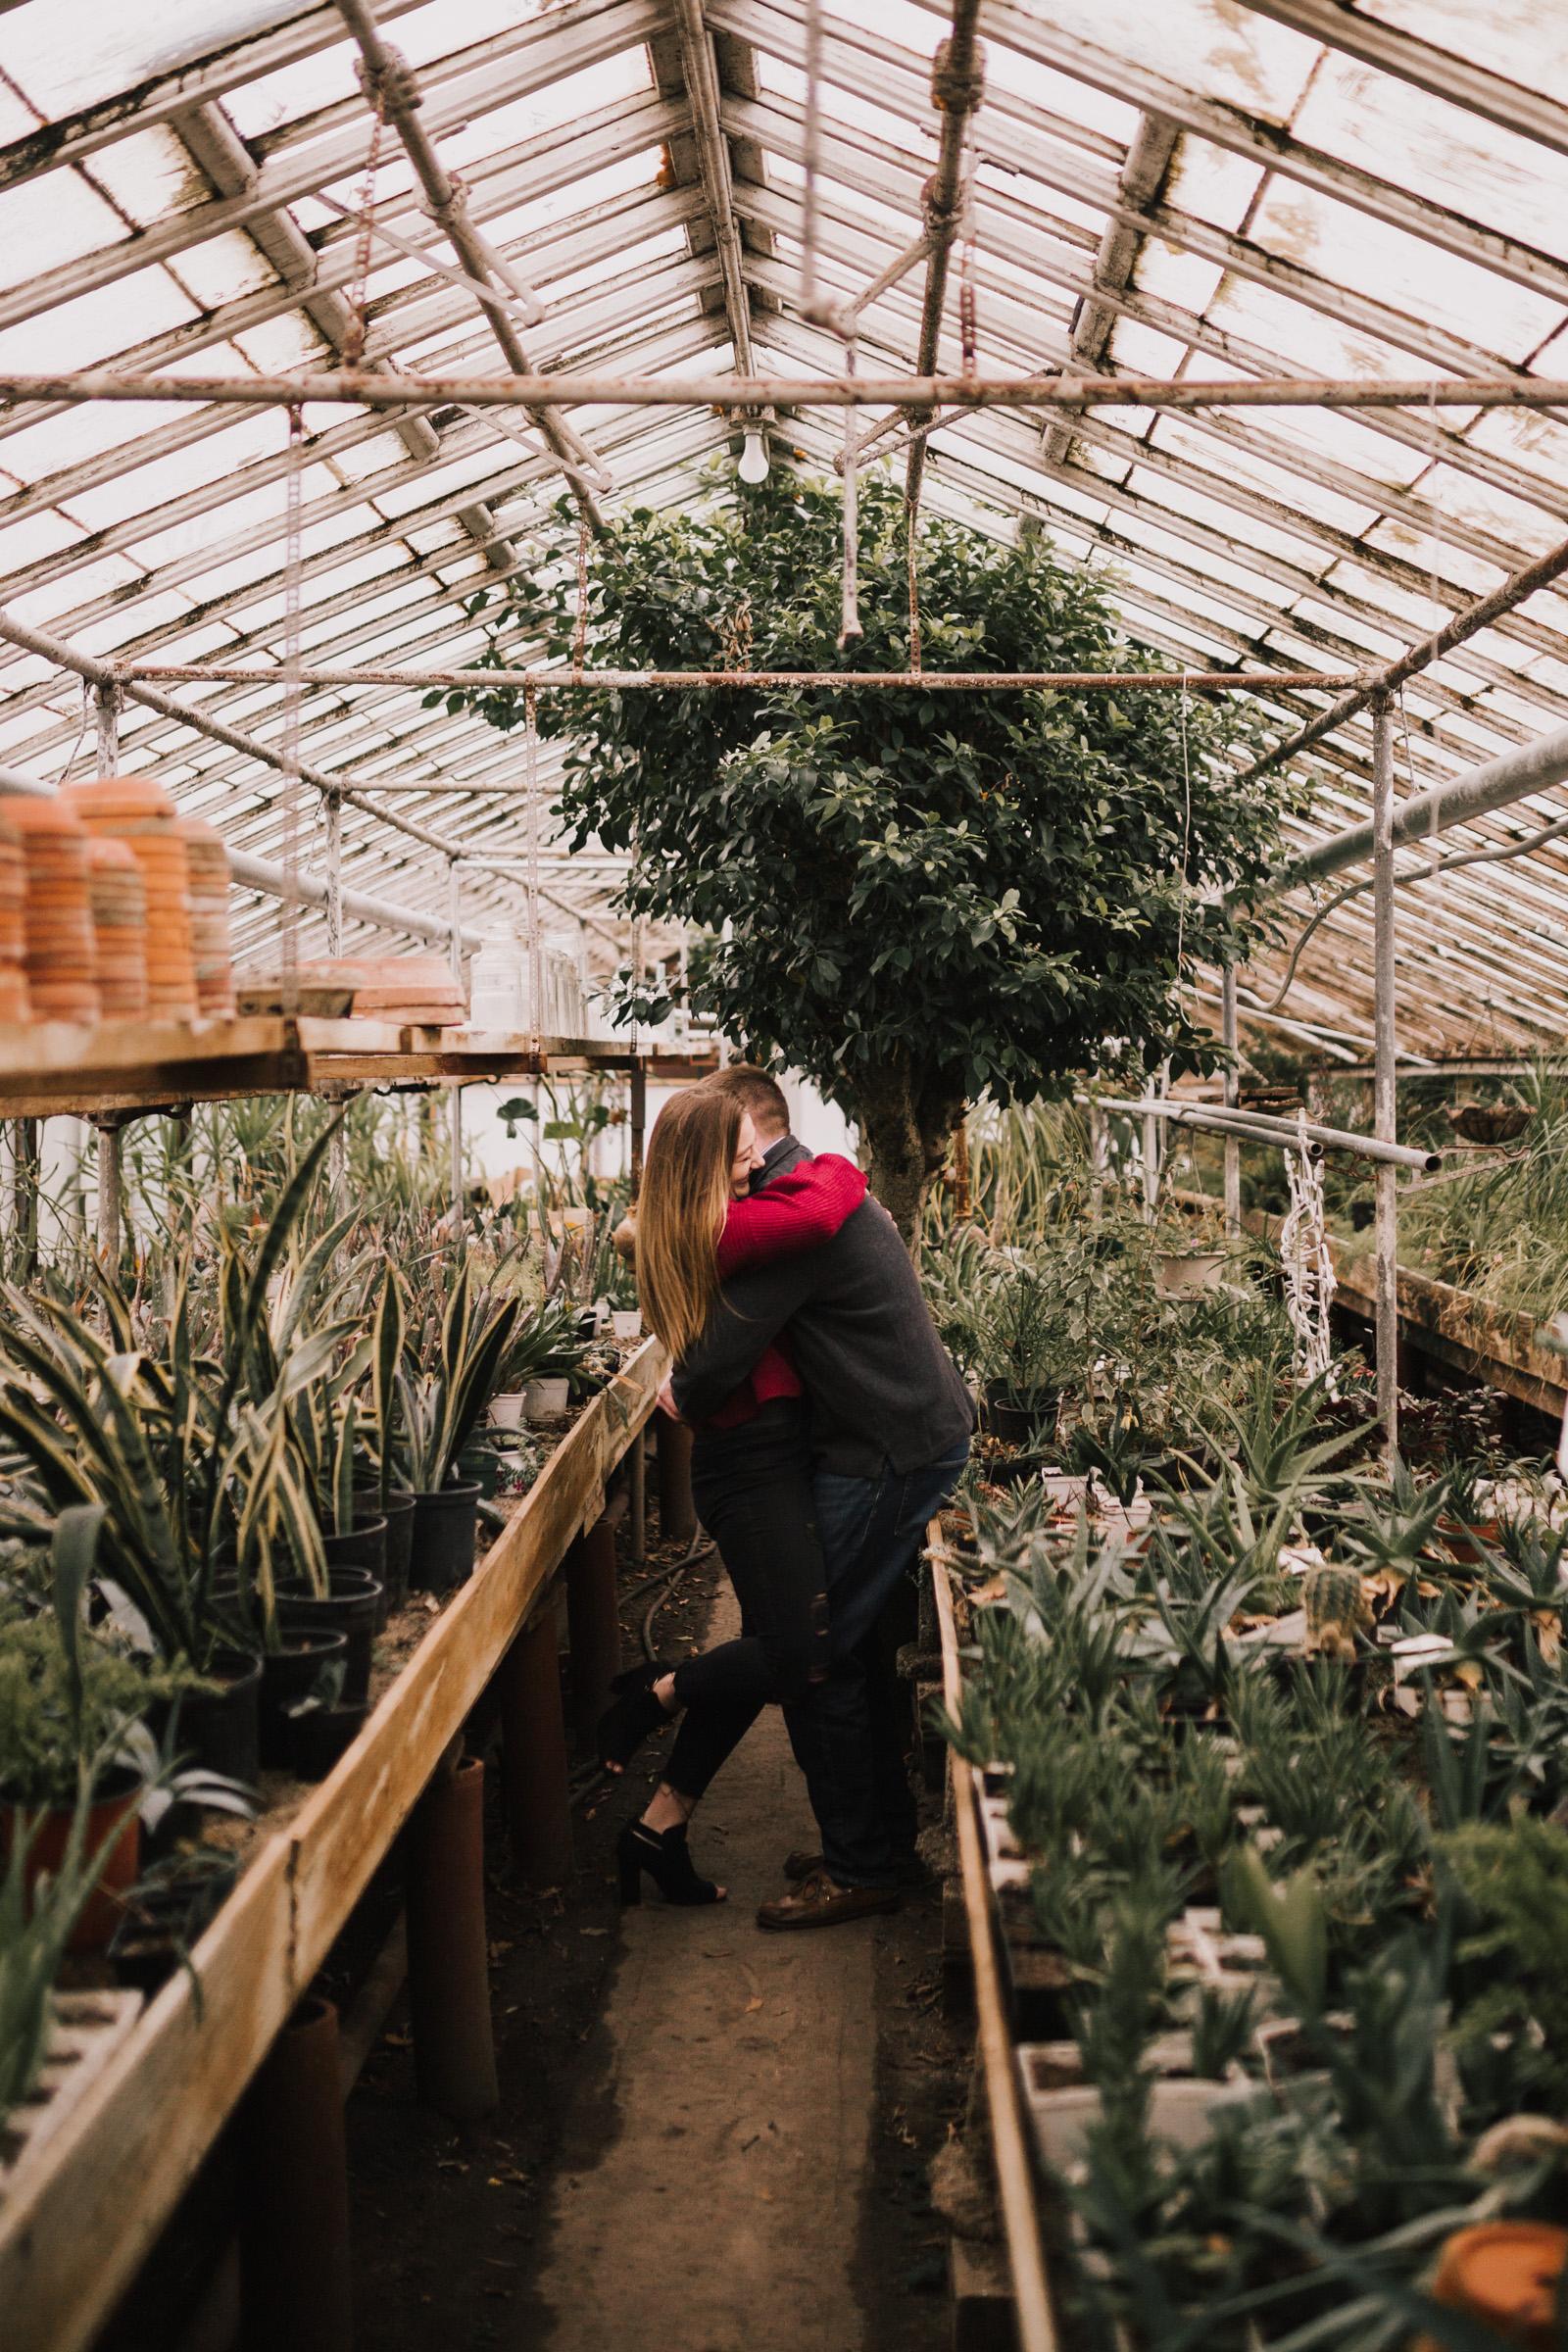 alyssa barletter photography johns greenhouse kansas city missouri brookside waldo engagement session winter-7.jpg